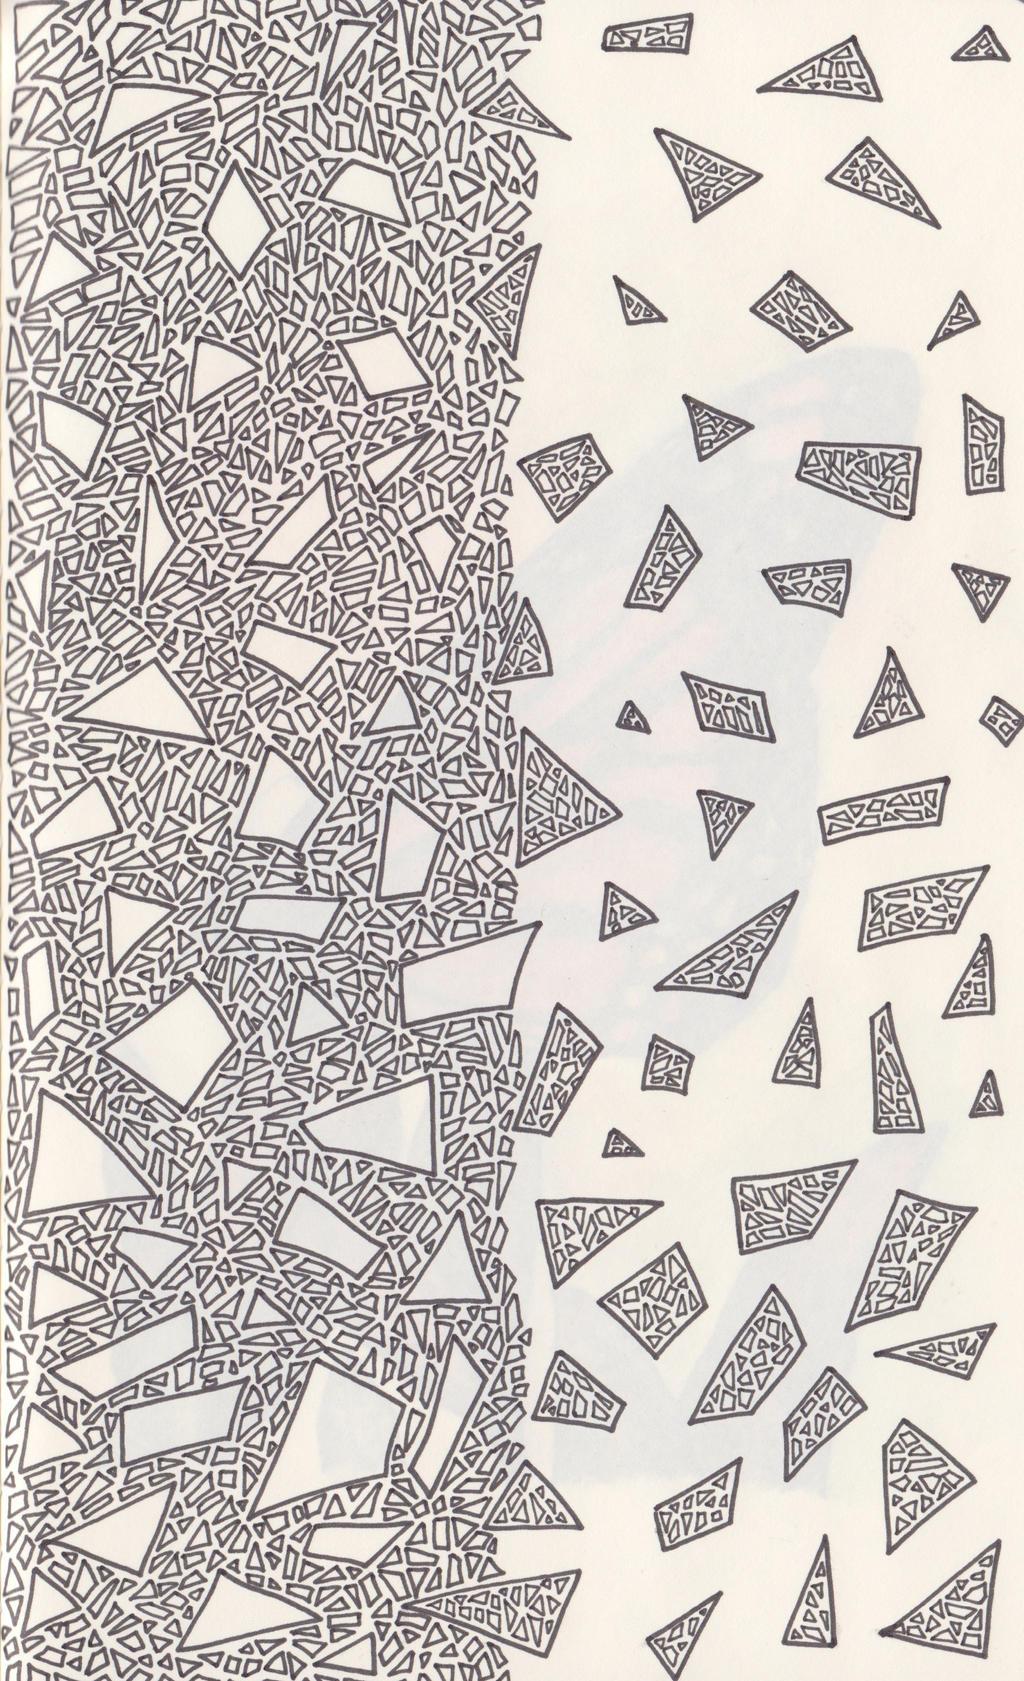 Geometry Doodle by sophiemai Geometry Doodle by sophiemai